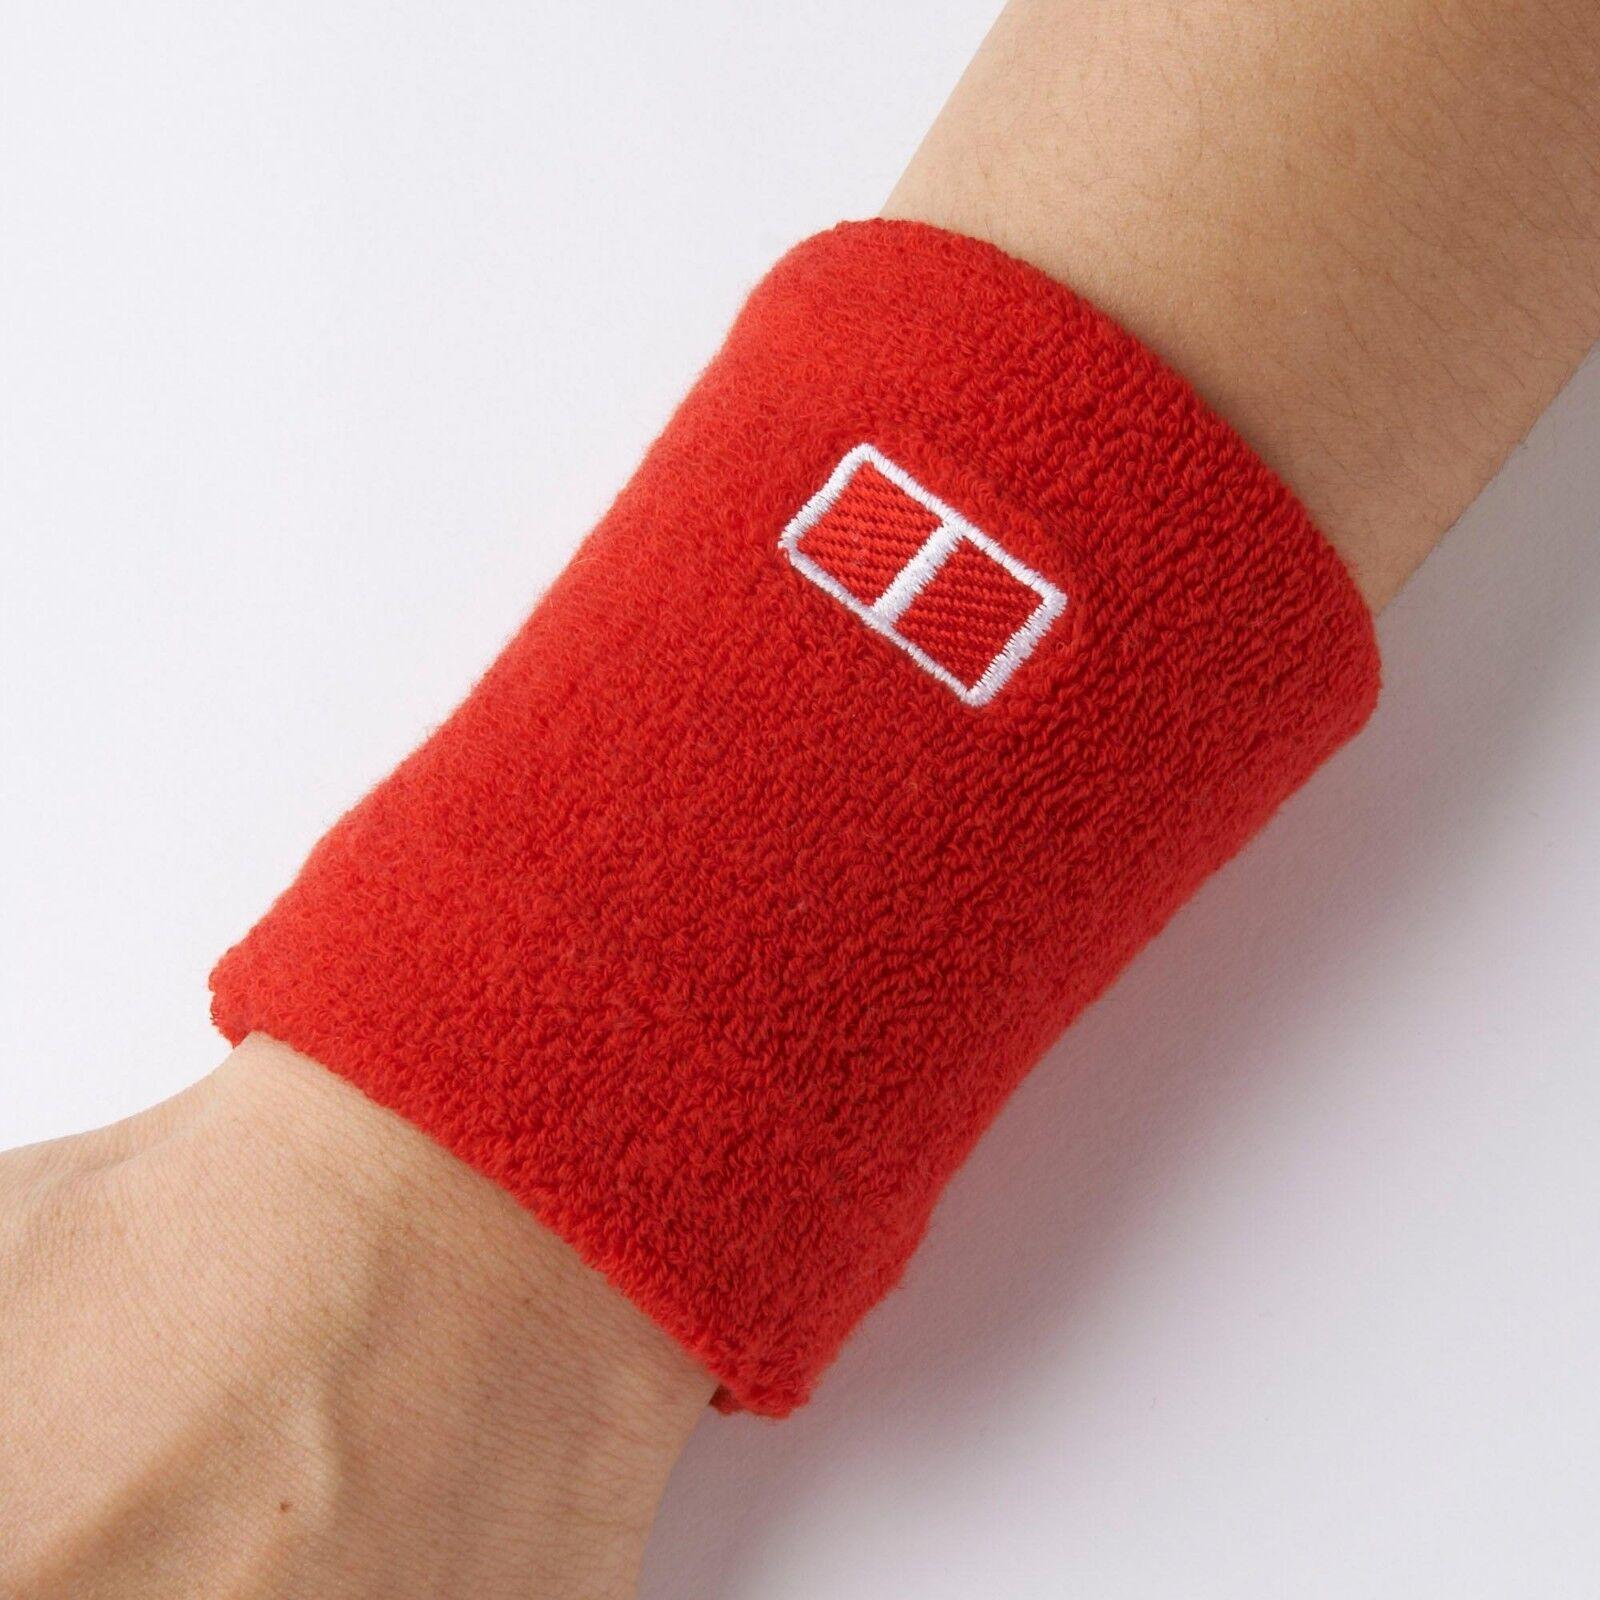 UNIQLO x Novak Djokovic Set of 2 Wristbands Kei Nishikori Tennis US Open Red NIP